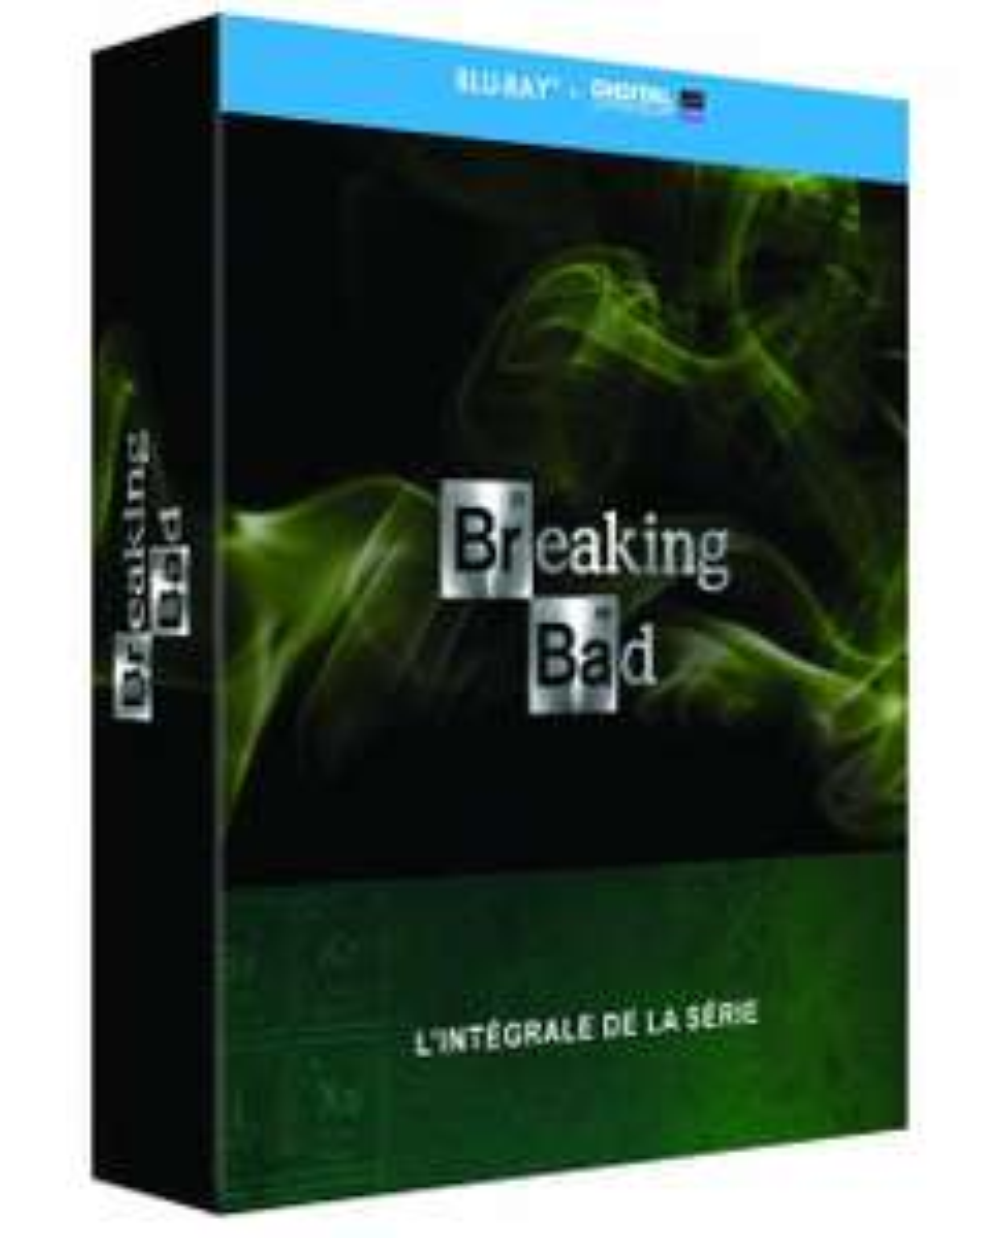 Breaking Bad (kompletna seria) na Blu-Ray za ok. 220zł @ Amazon.es